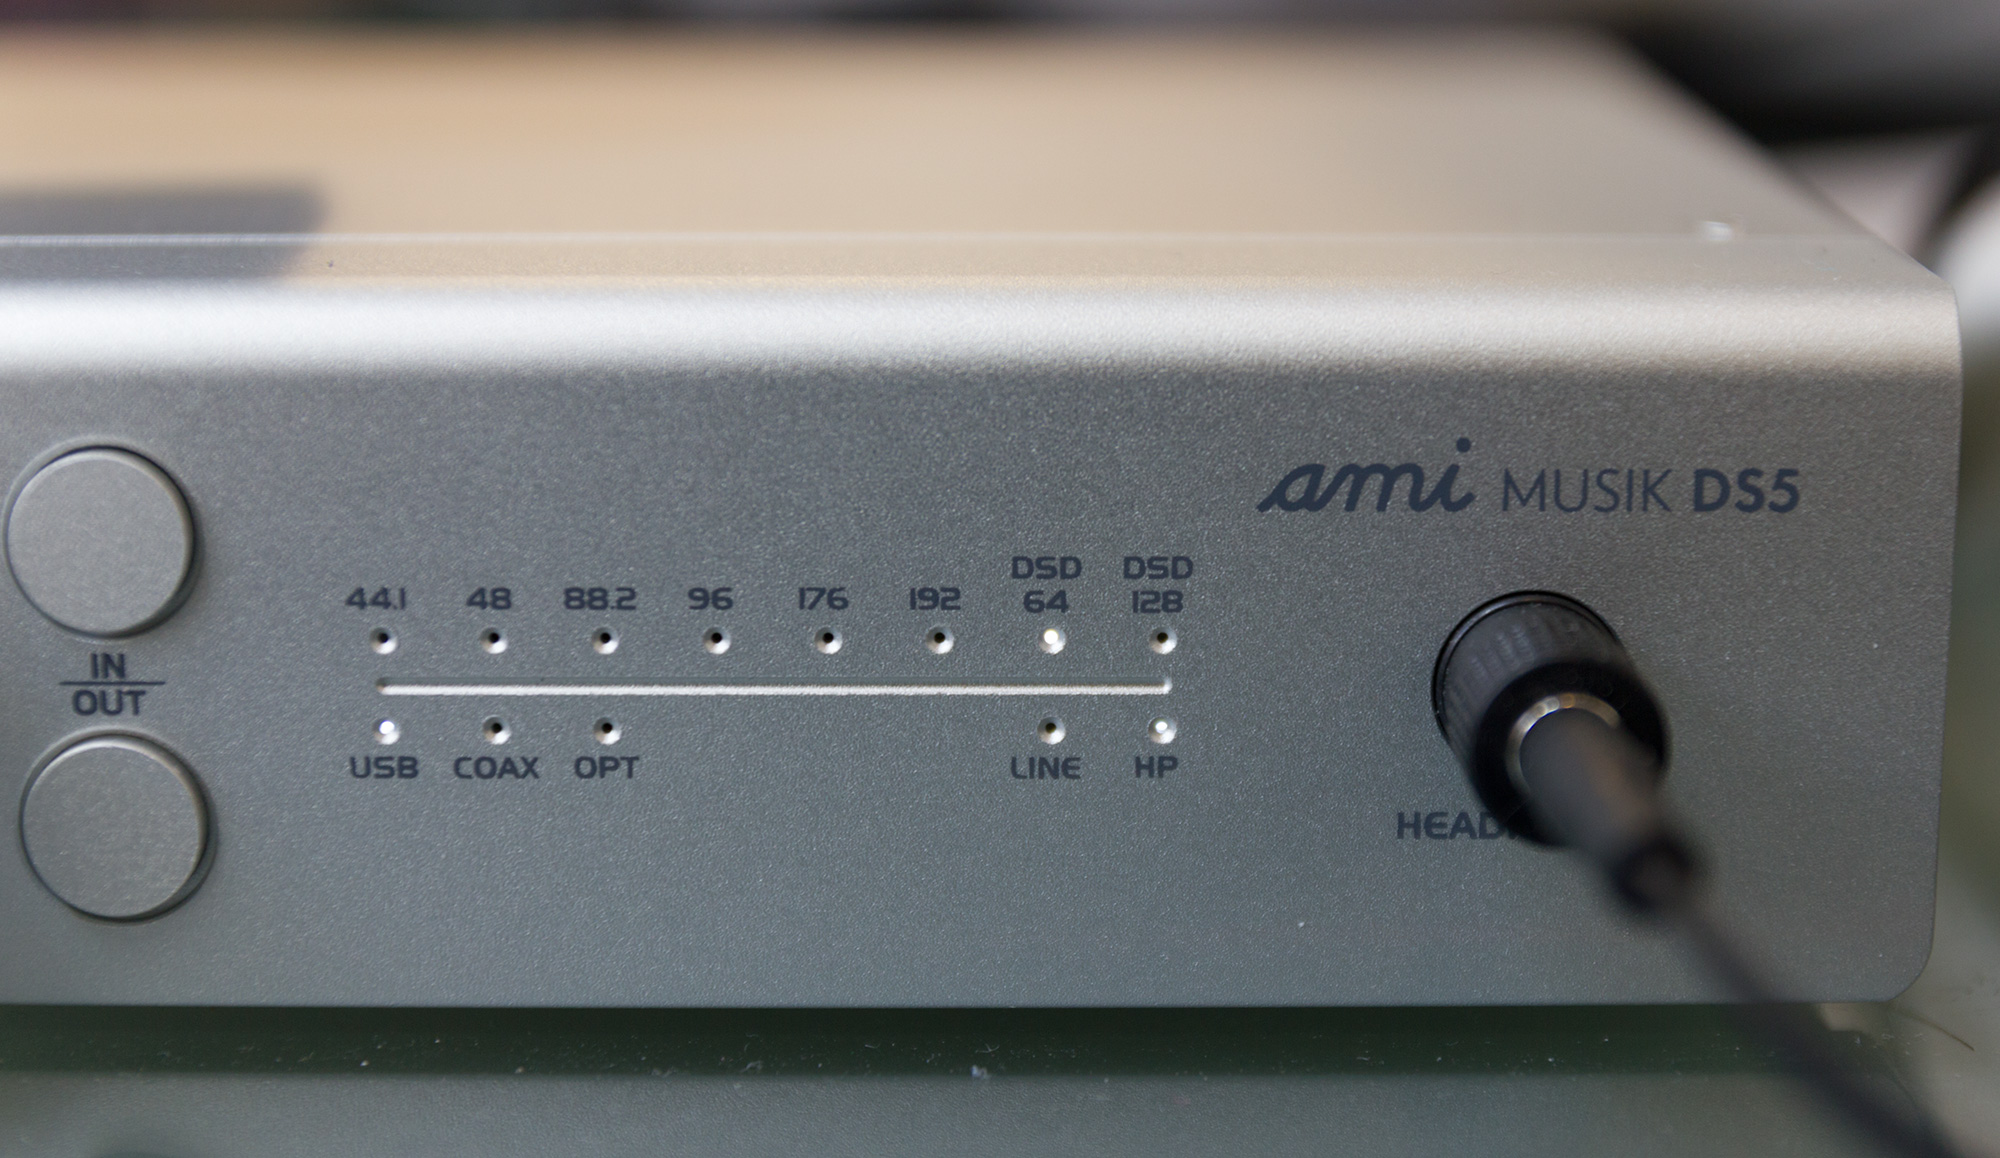 AMI International MUSIK DS5 USB Driver for Windows